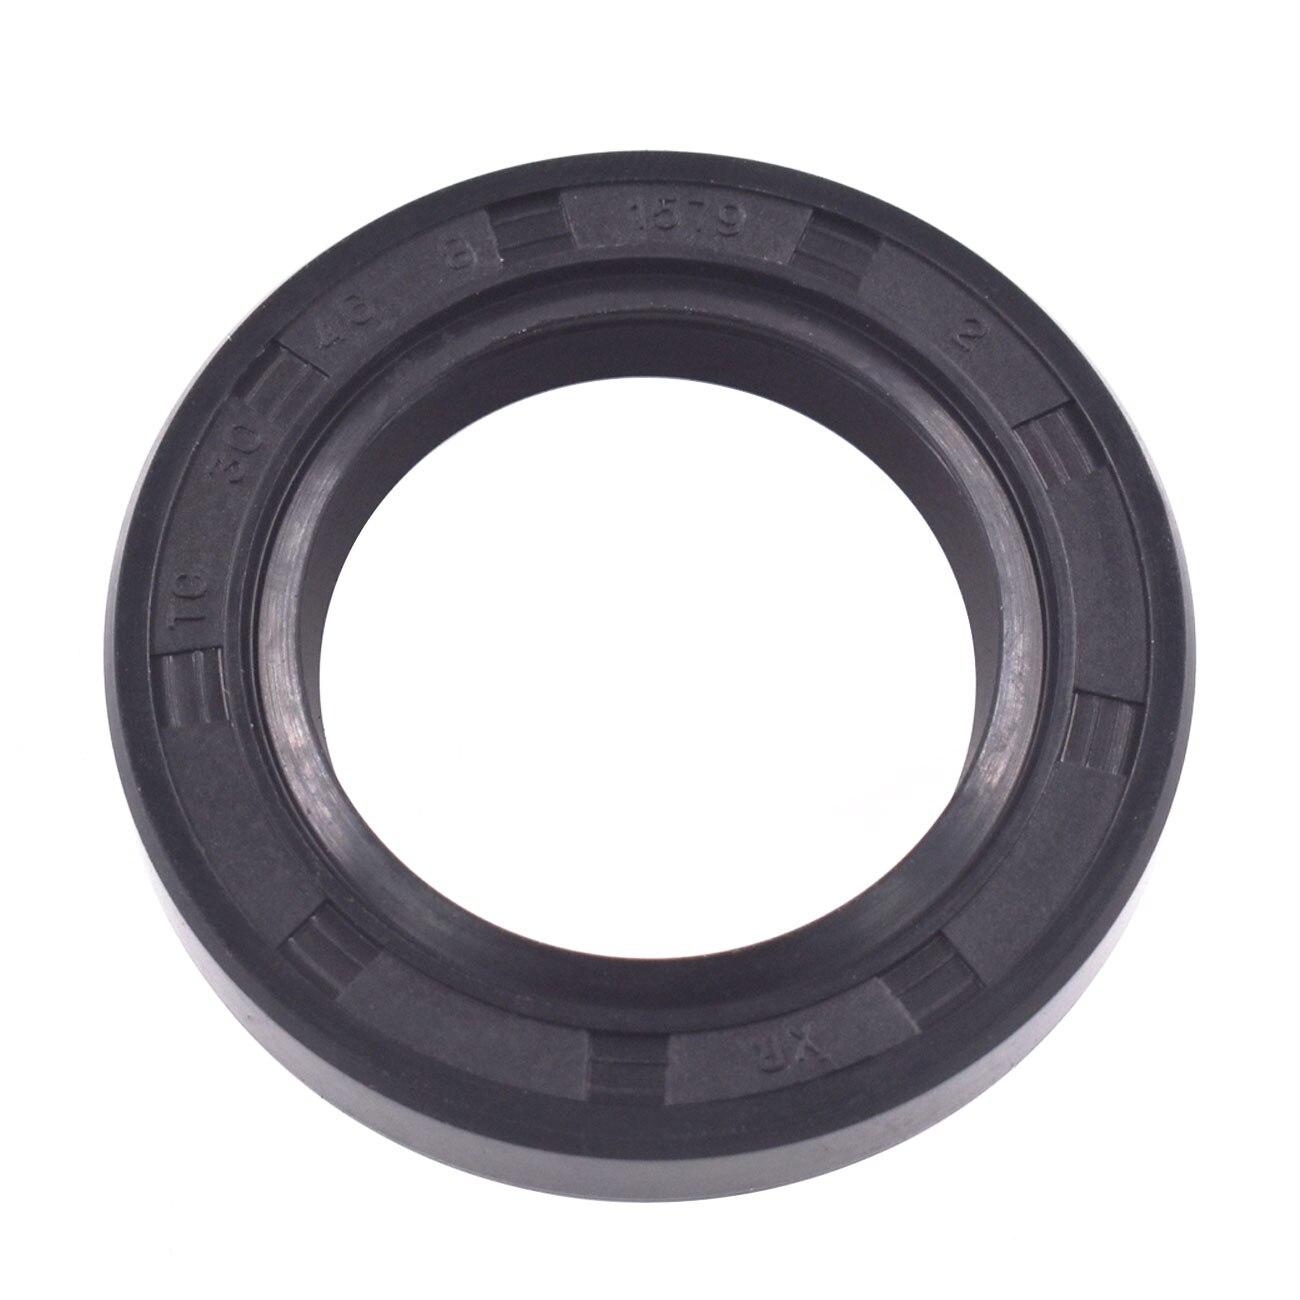 Crankshaft Oil Seal Fits Honda GX240 GX270 8HP 9HP Engine 30*46*8mm